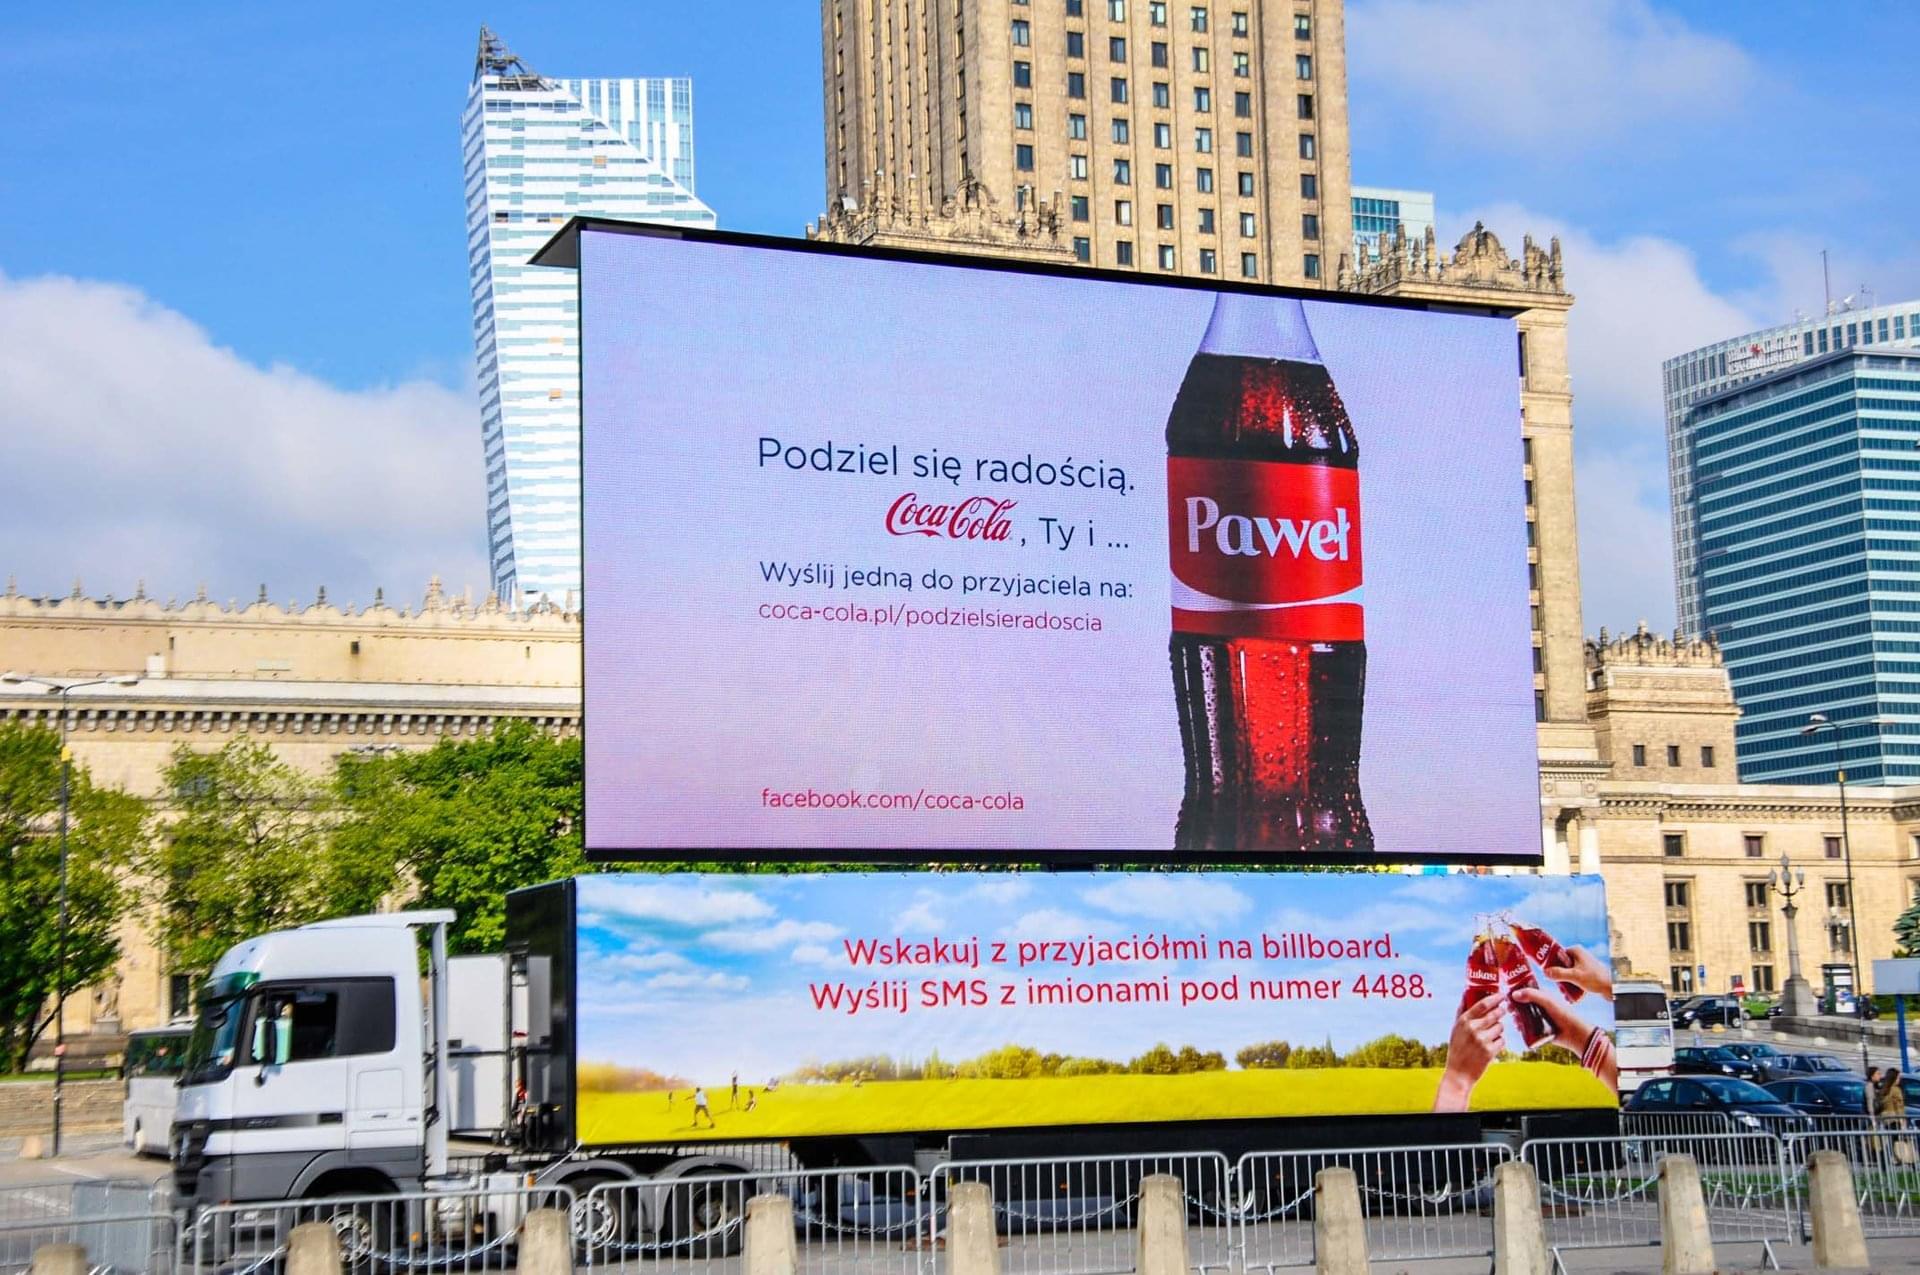 Warsaw Coca Cola campaign